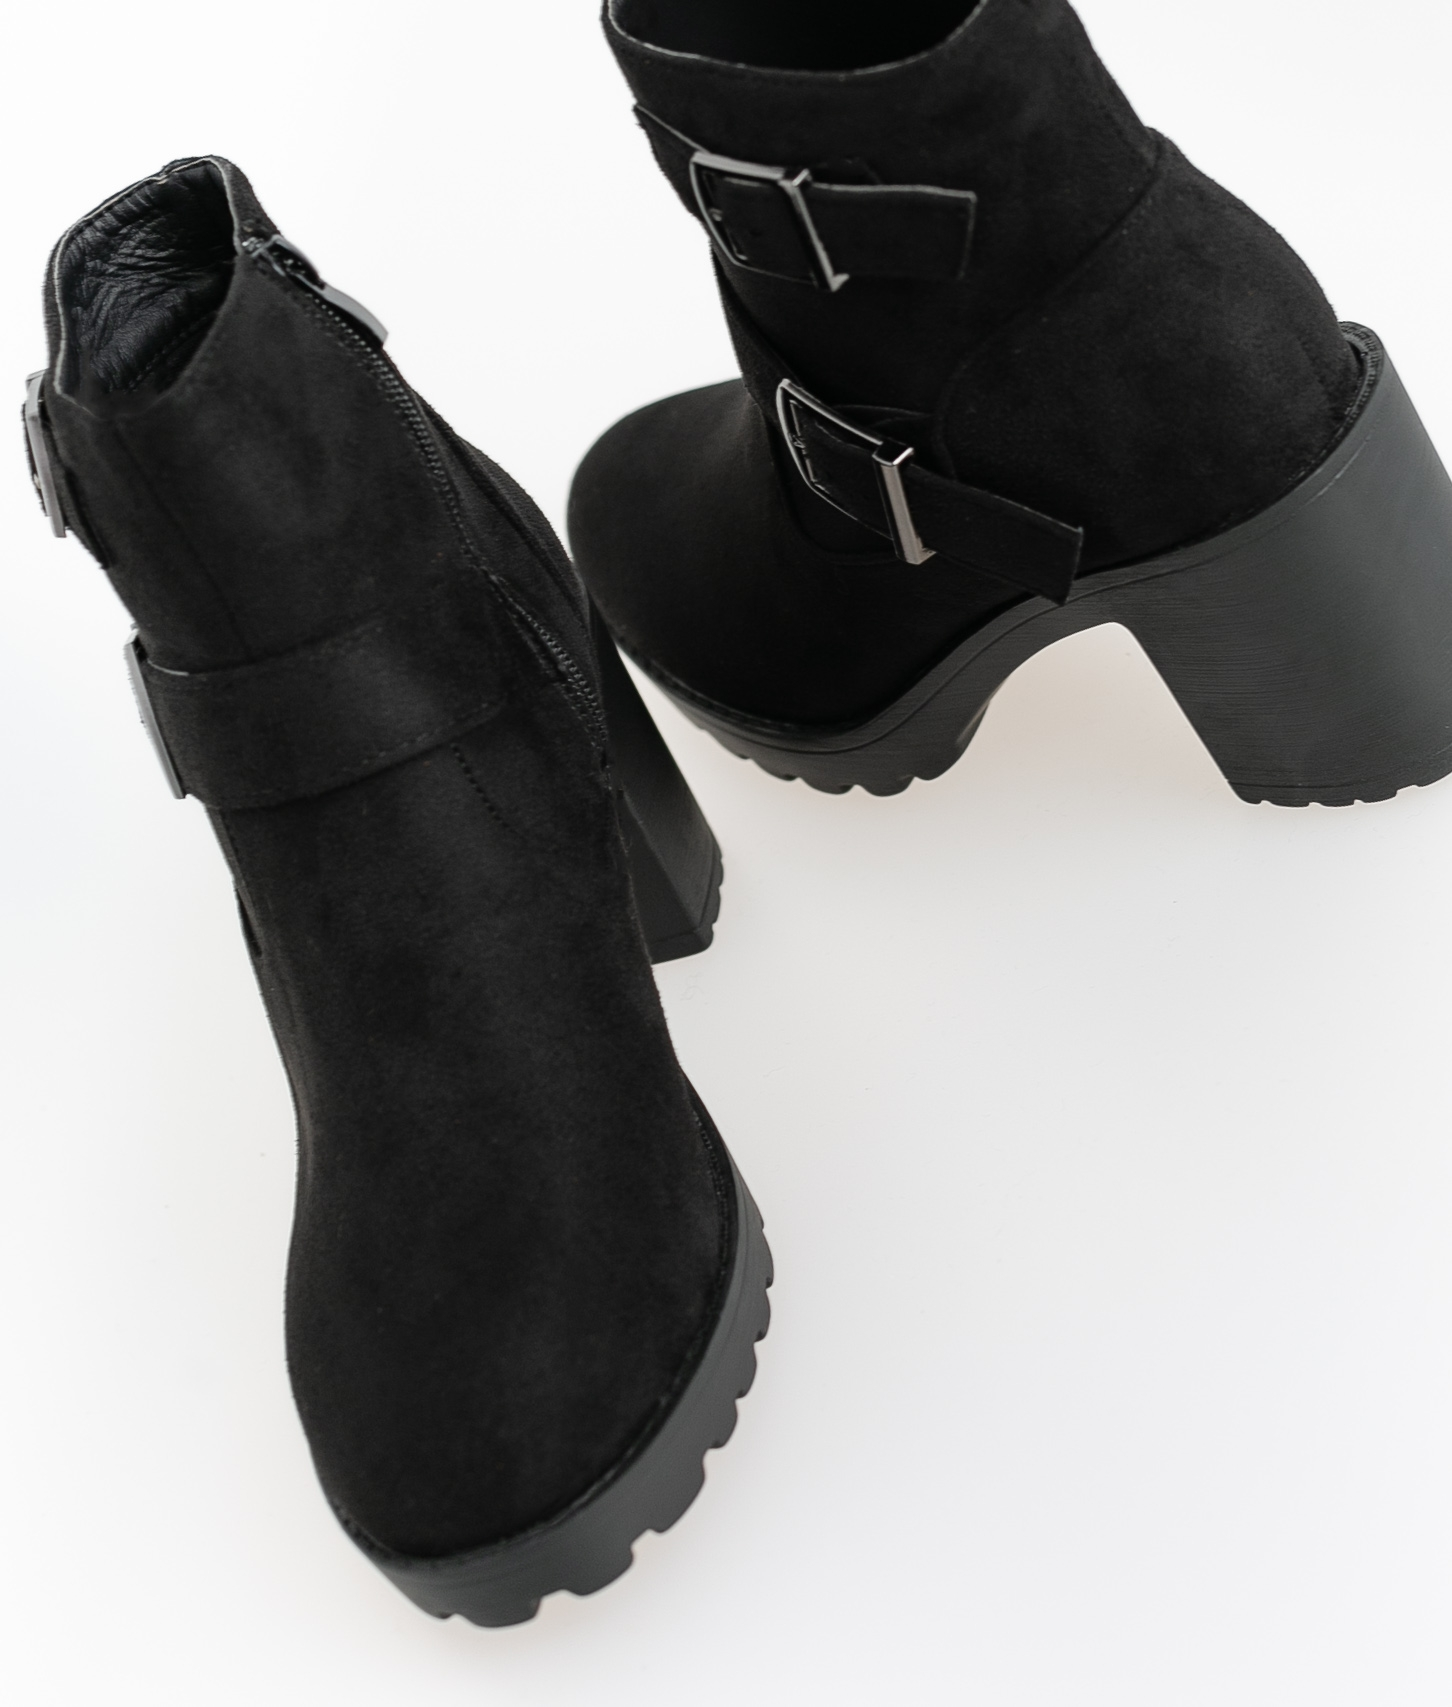 Bota Baja Rupert - Negro